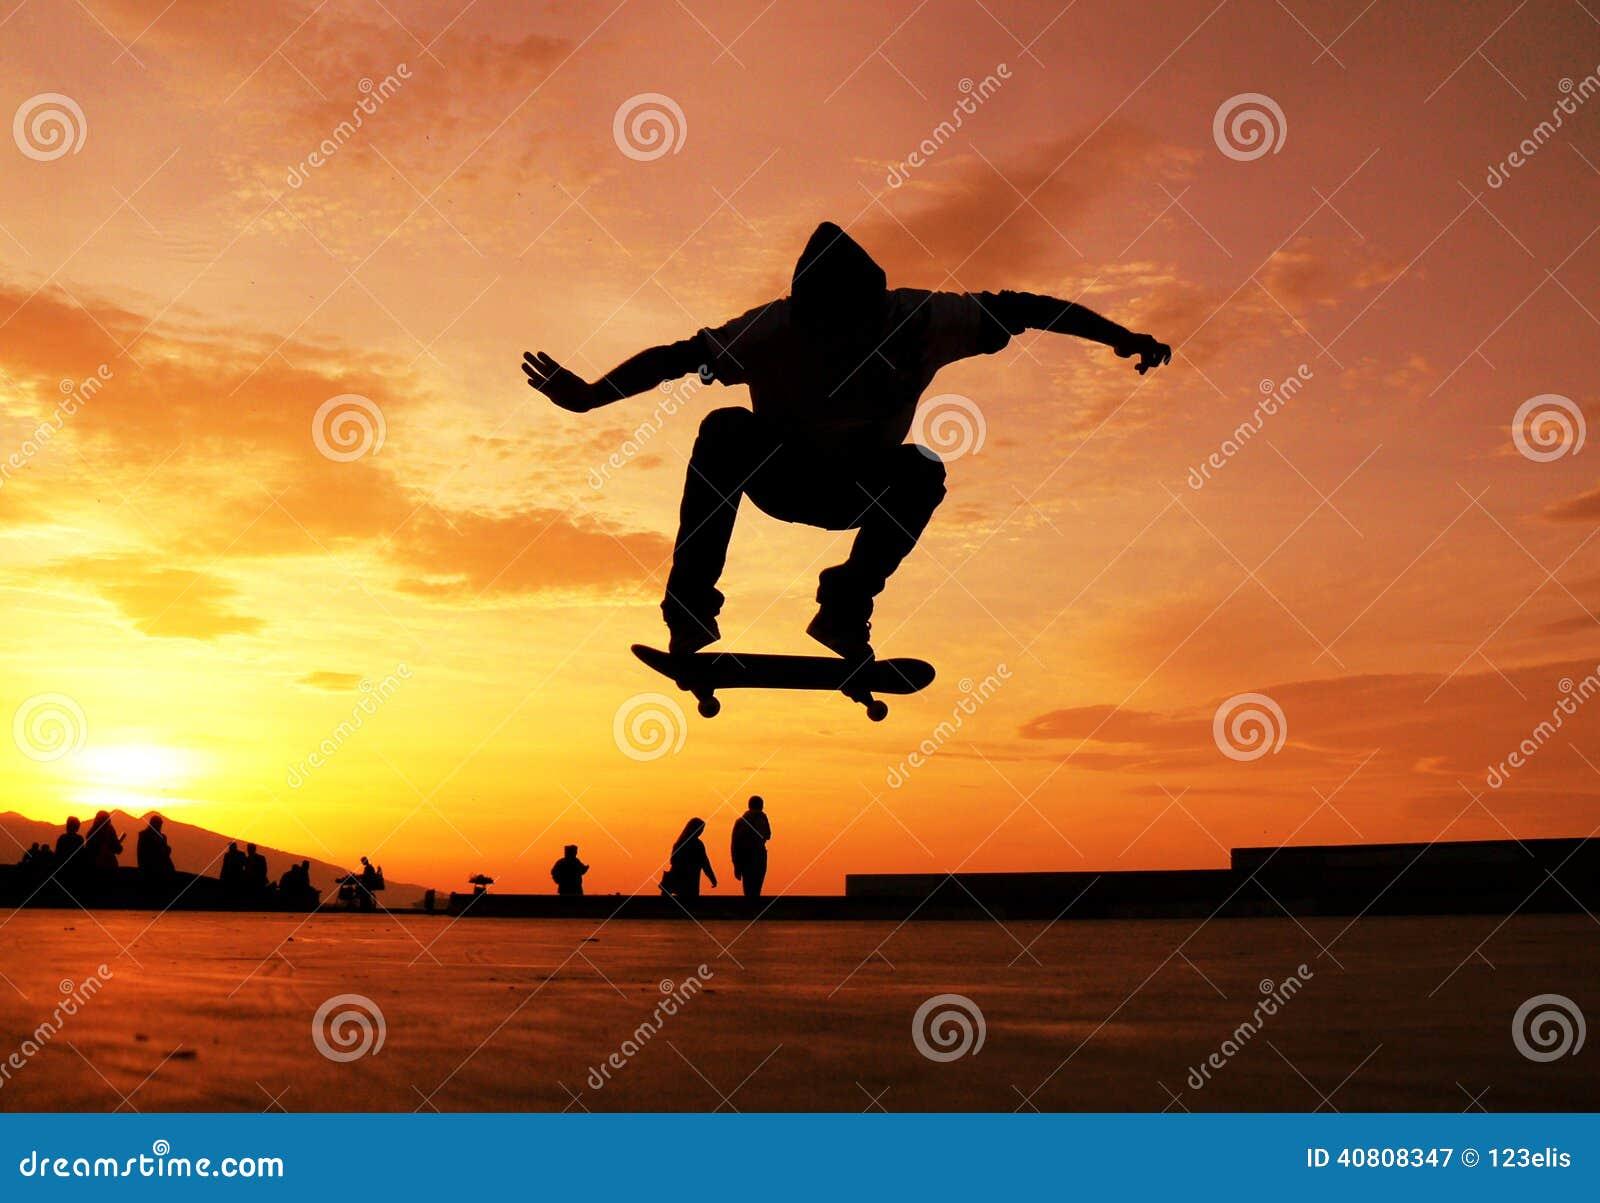 Skateboarding photography sunset